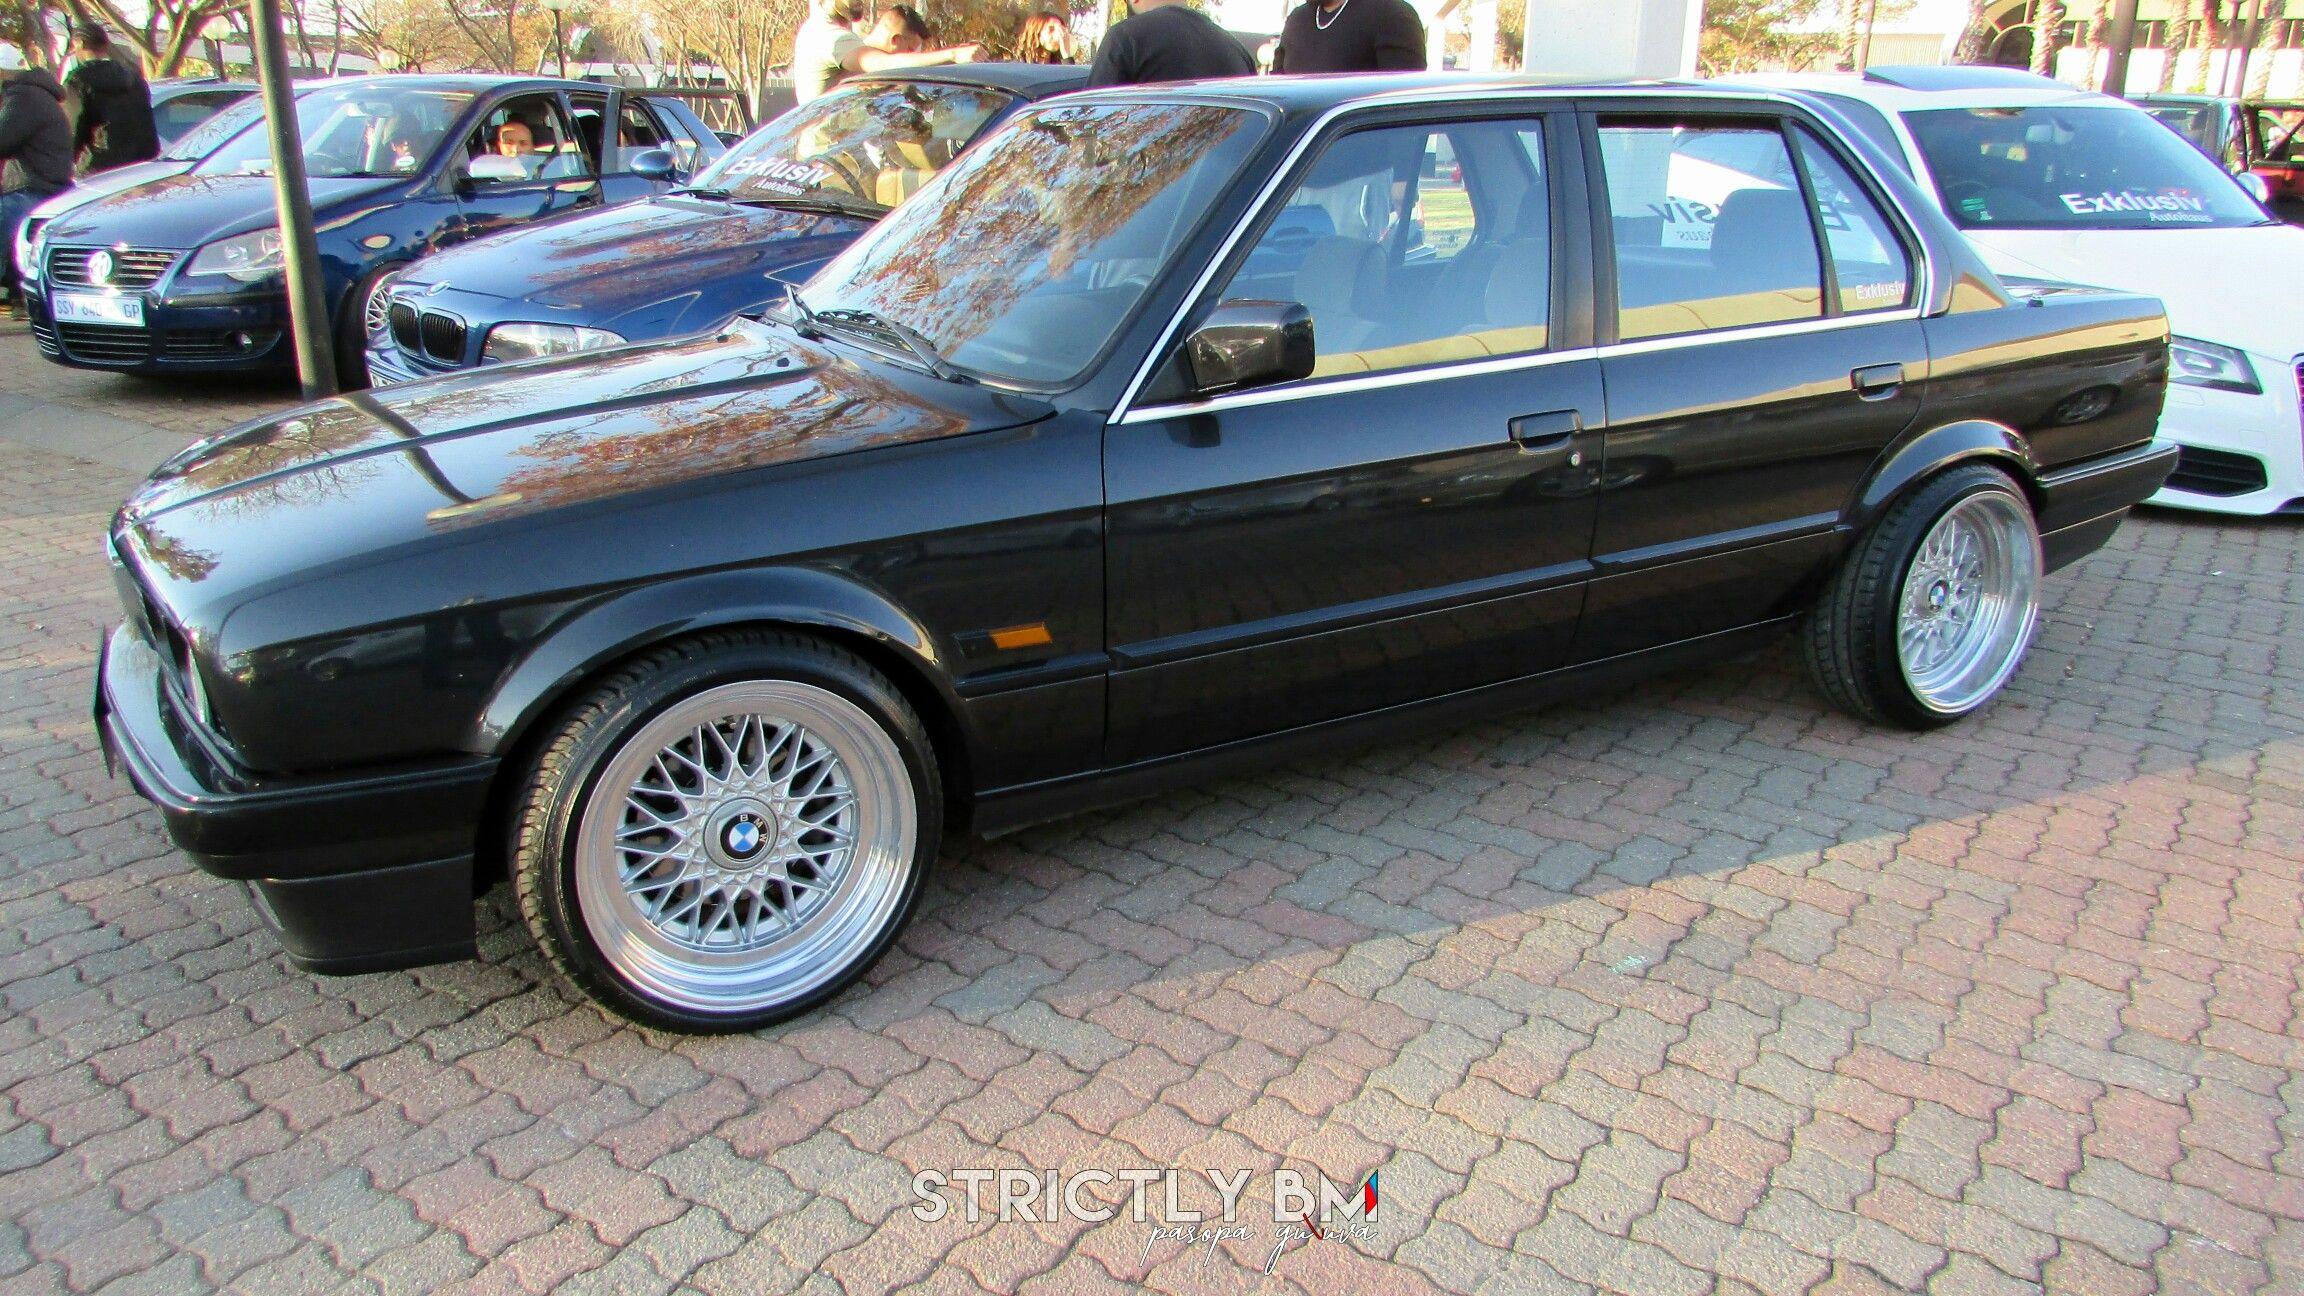 This Car Owner Arie 333i Bmw Bmwclassic E30 320i